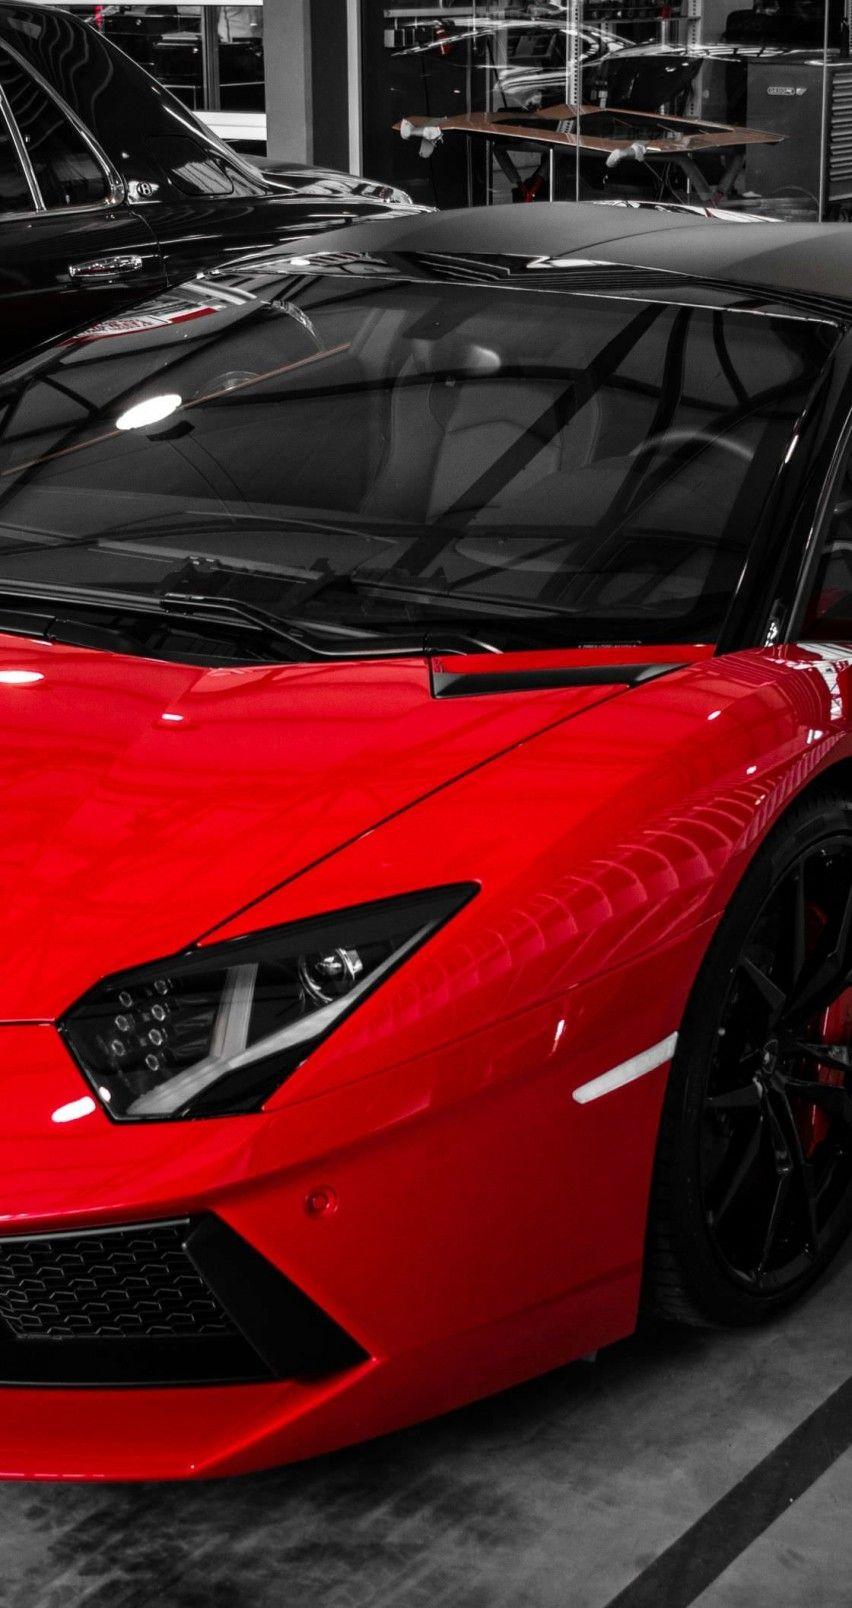 Iphone 7 Lamborghini Hd , HD Wallpaper & Backgrounds